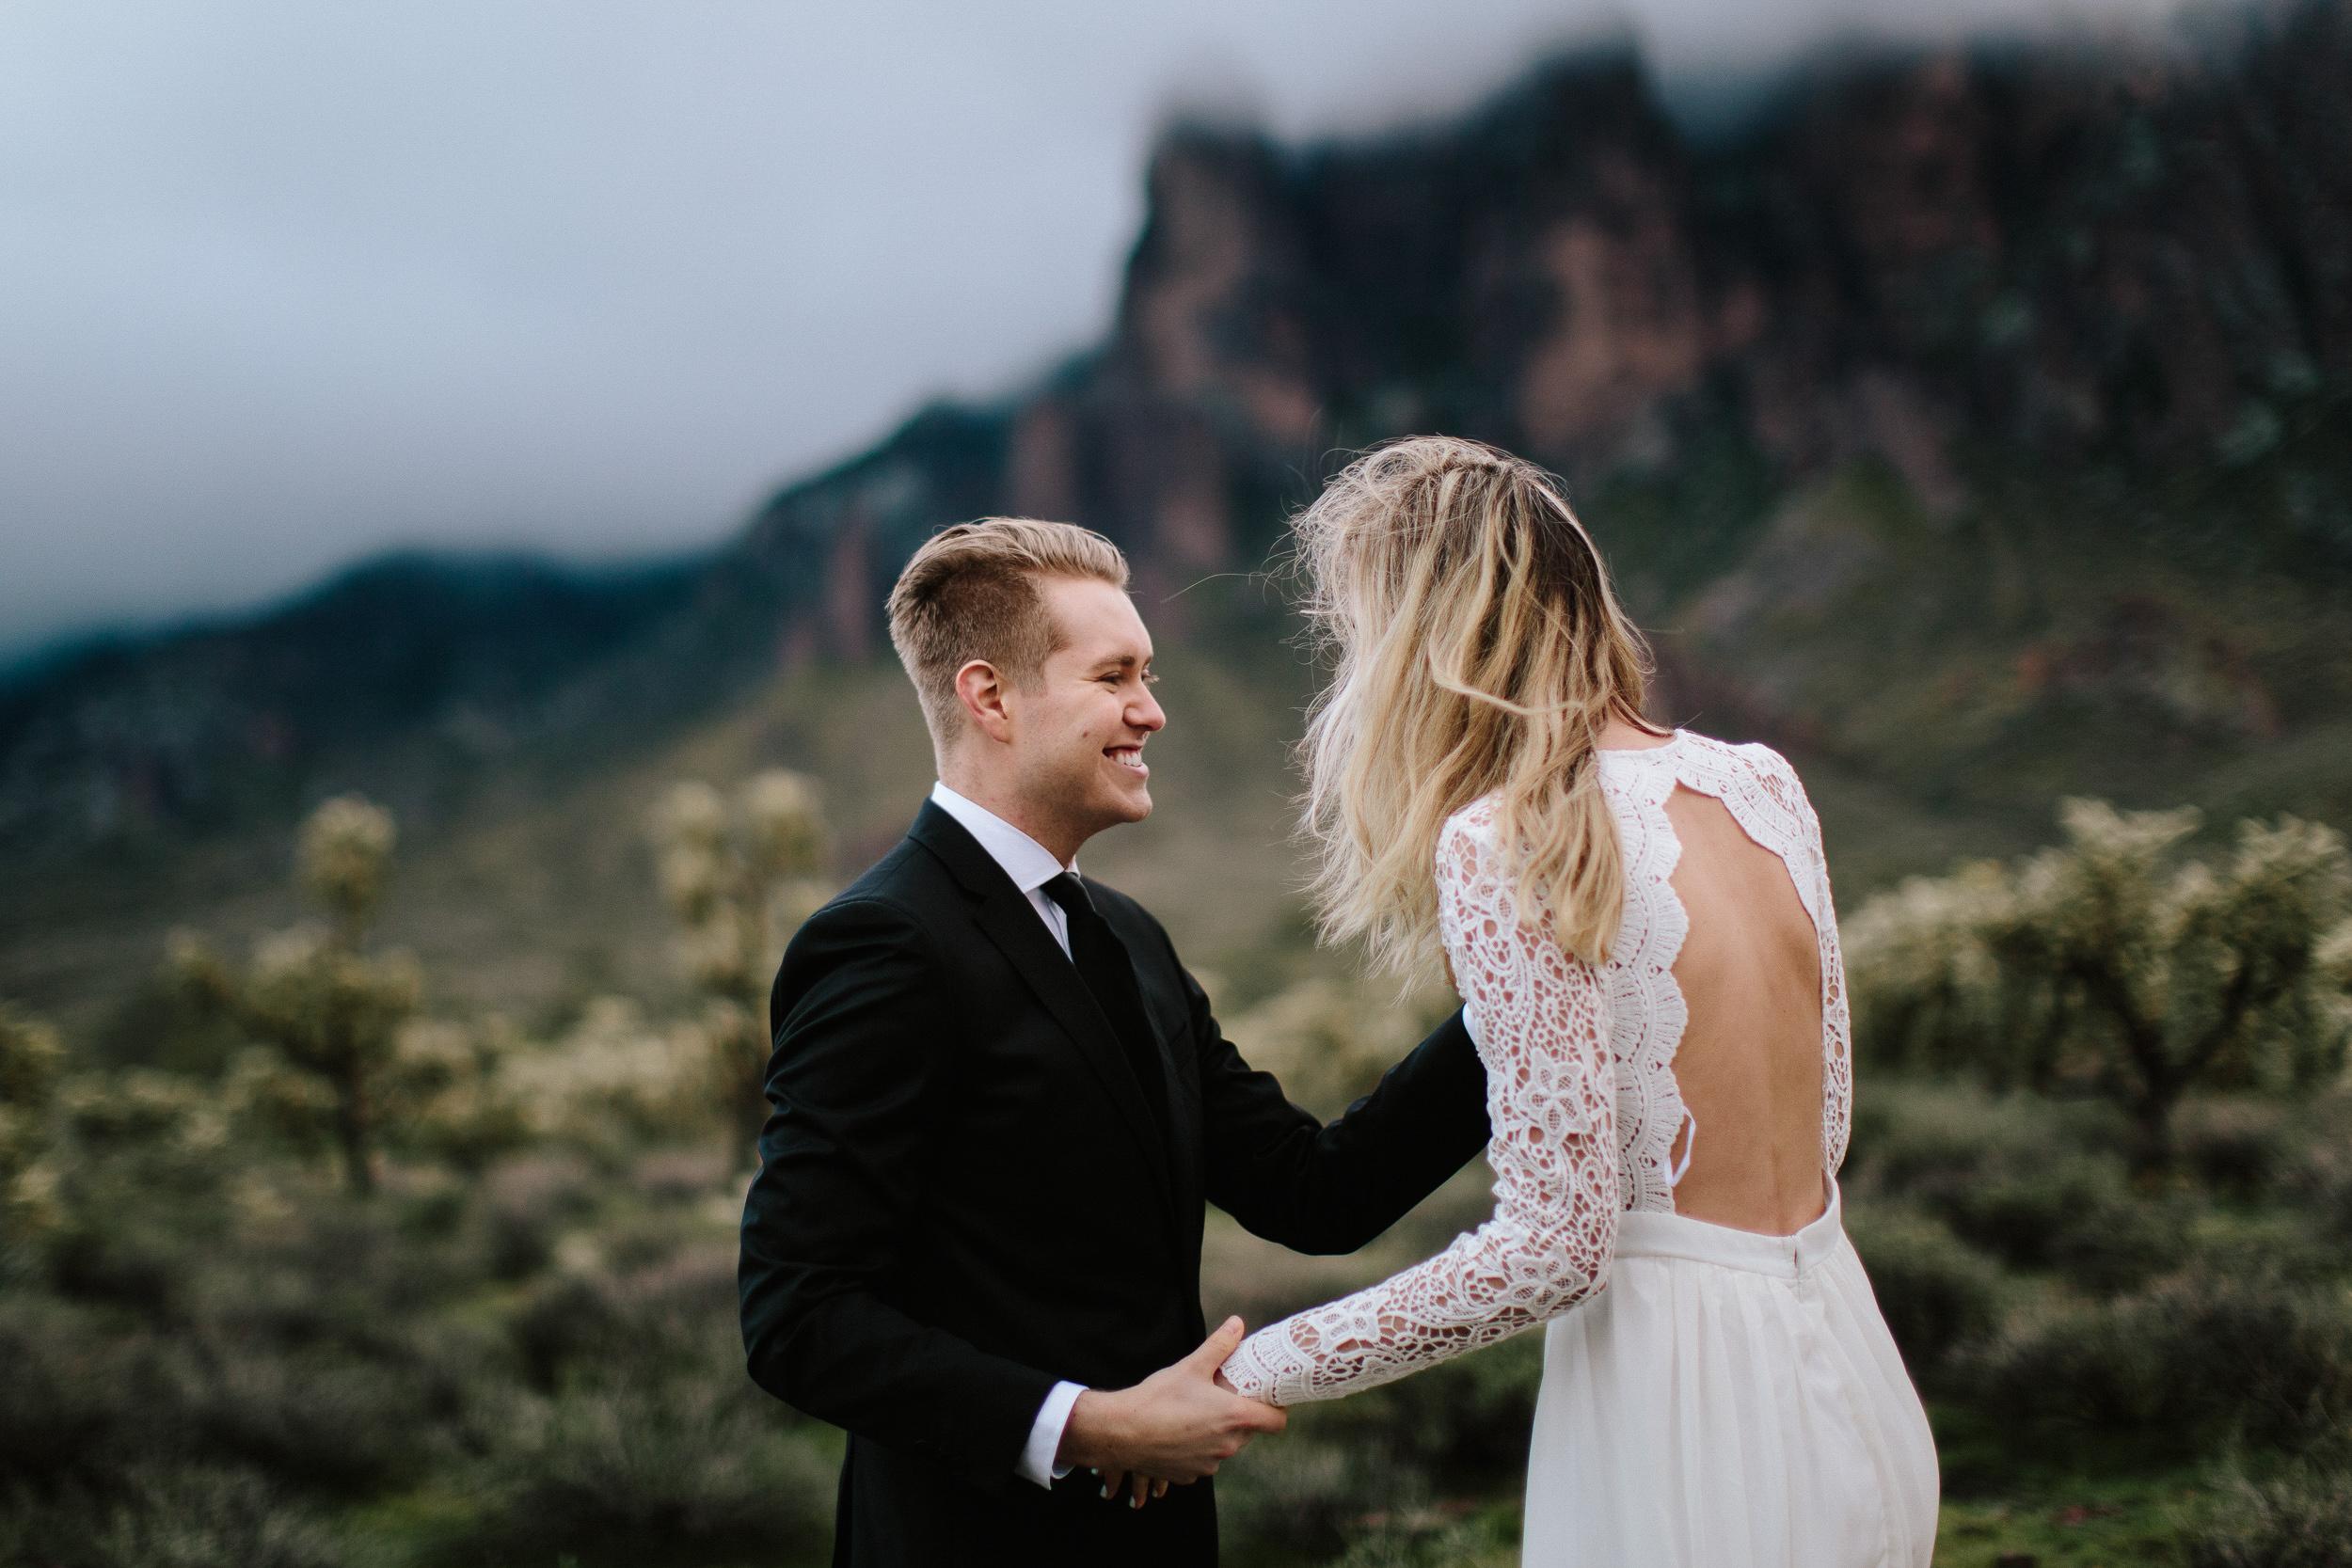 phoenix-mesa-elopement-wedding-photographer-lost-dutchman-state-park-superstitious-mountains-43.jpg